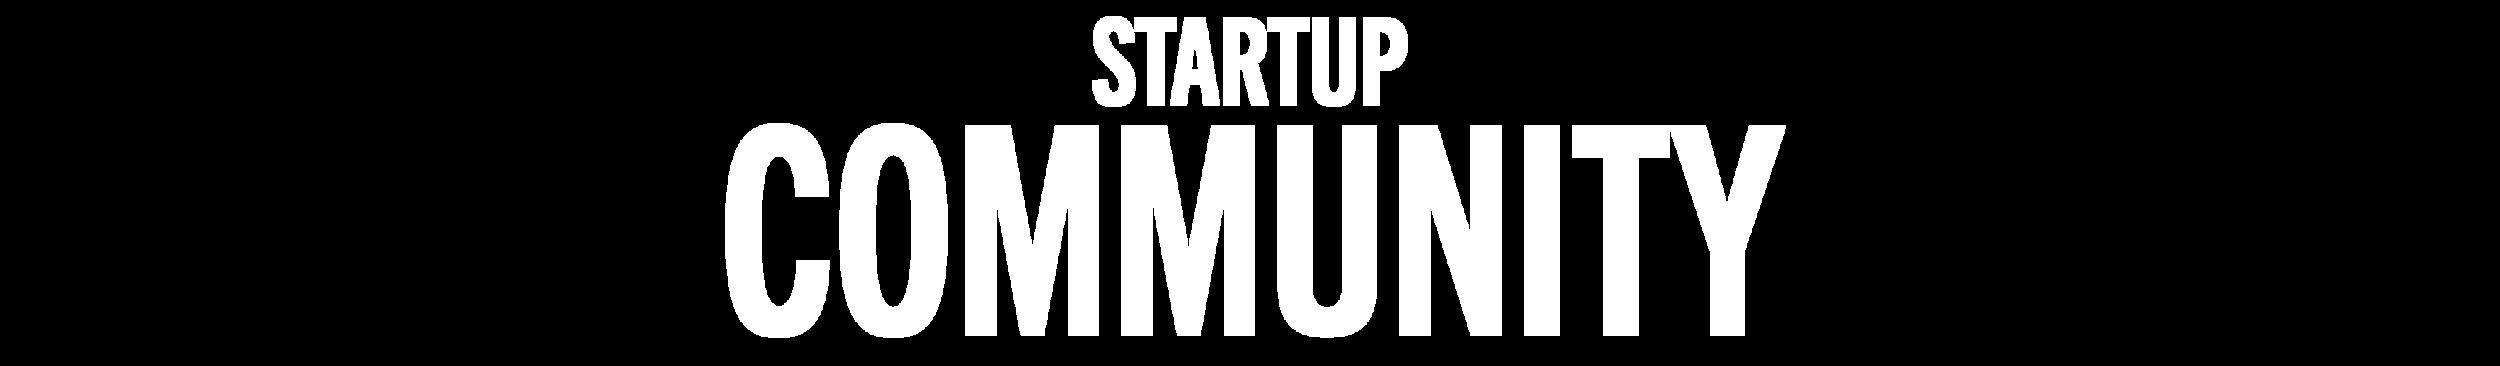 StartupCommunity-Header.png